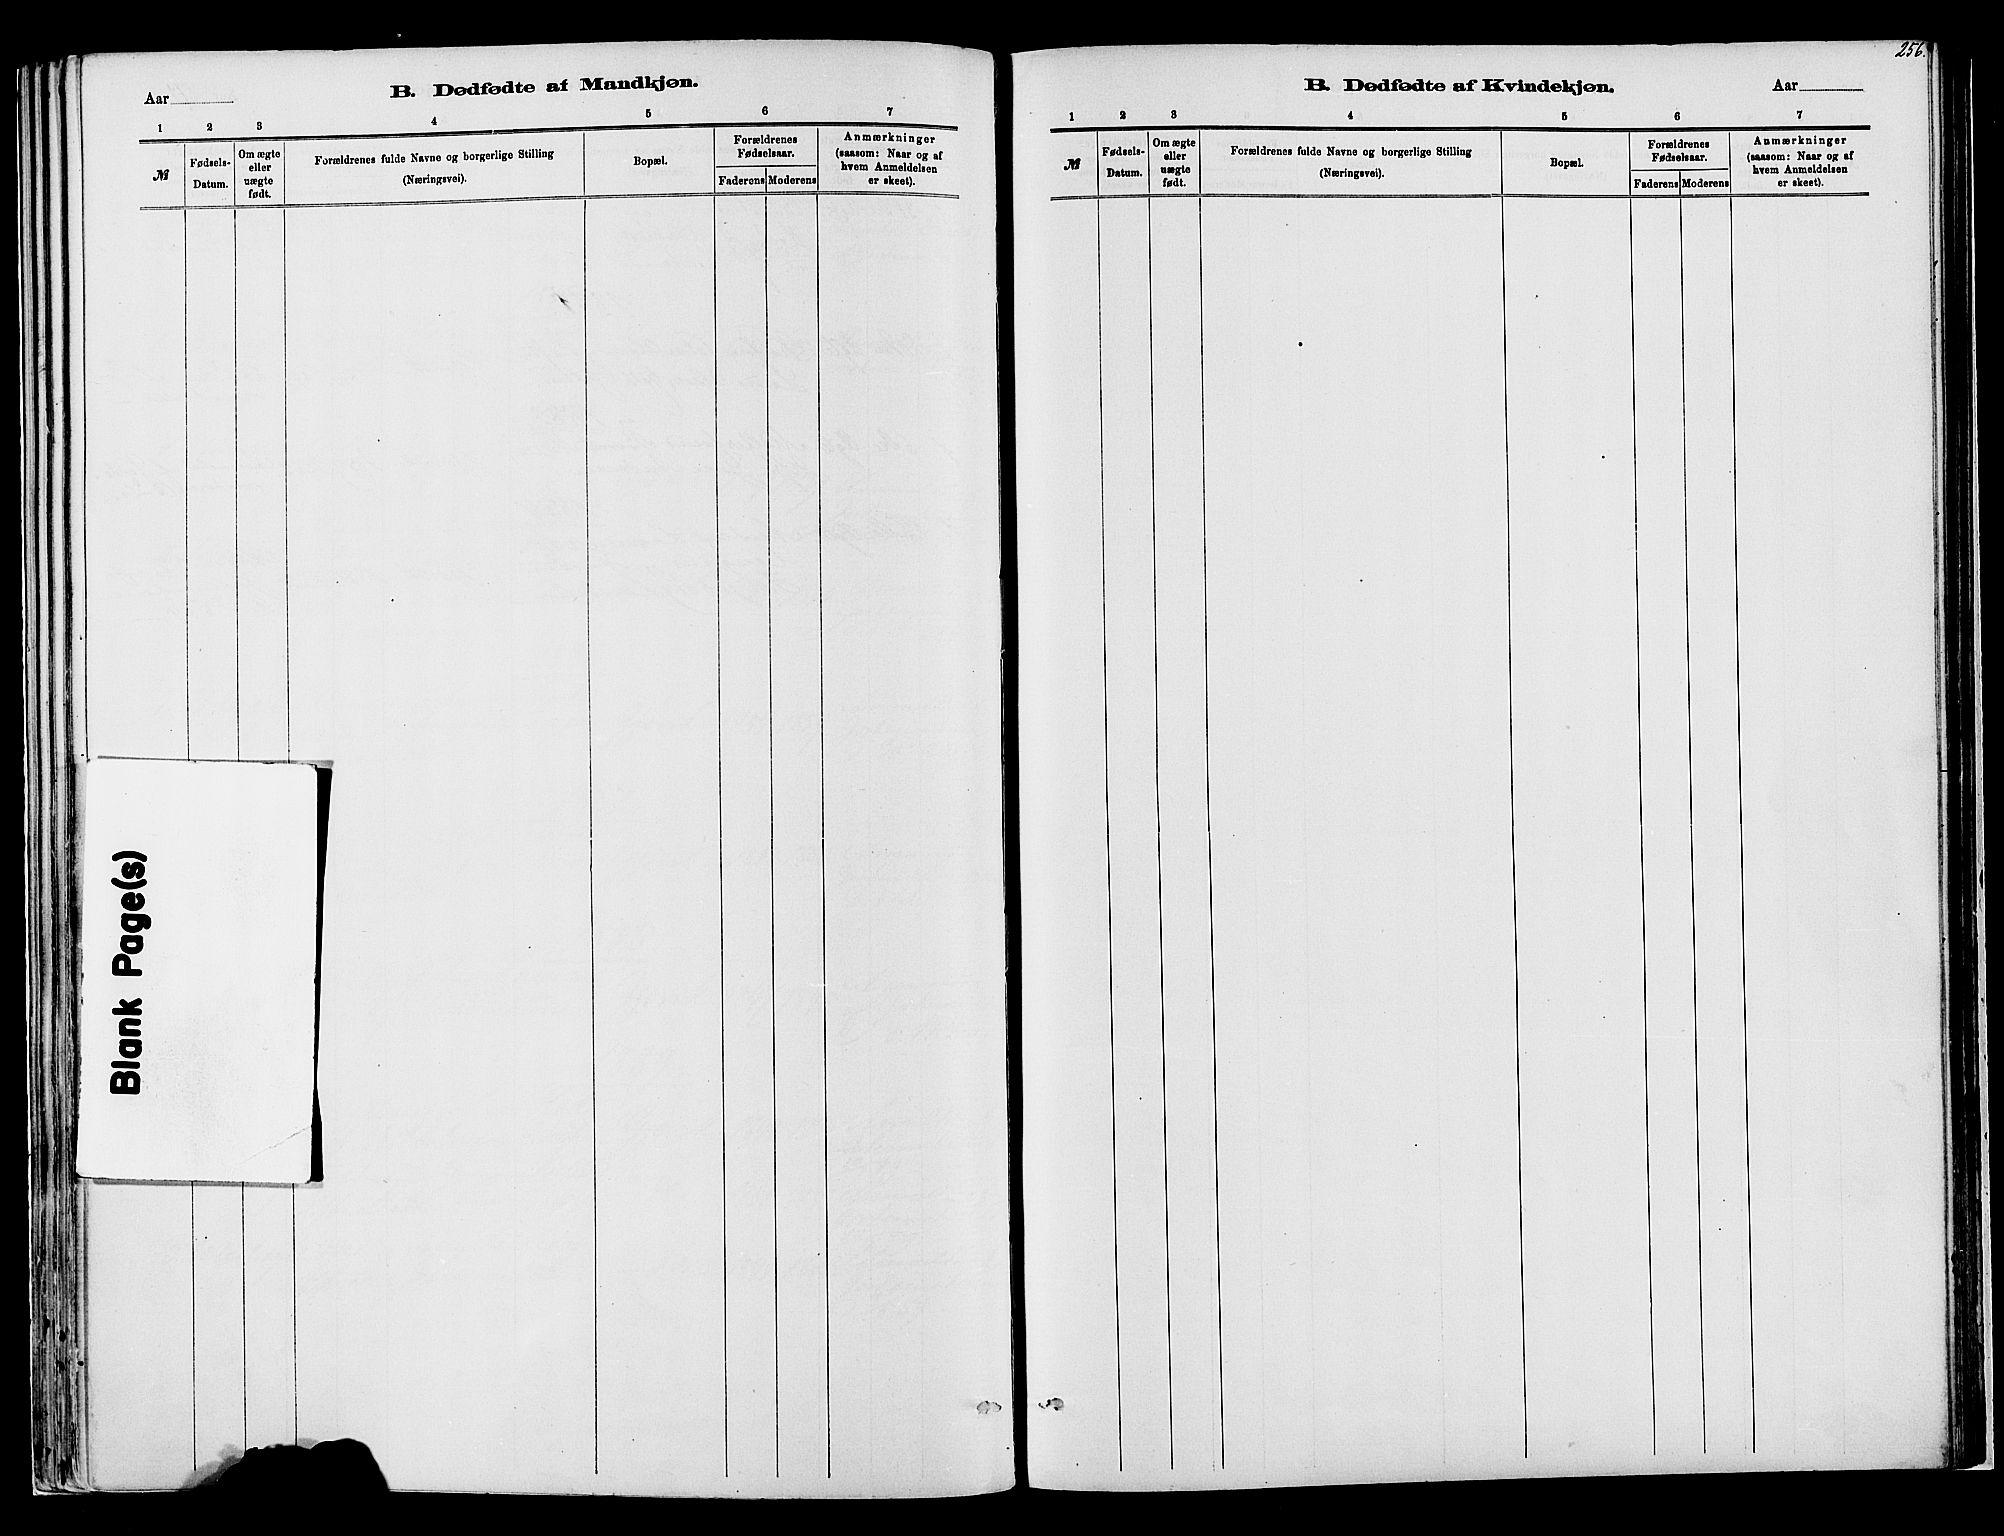 SAH, Vardal prestekontor, H/Ha/Haa/L0008: Ministerialbok nr. 8, 1878-1890, s. 256